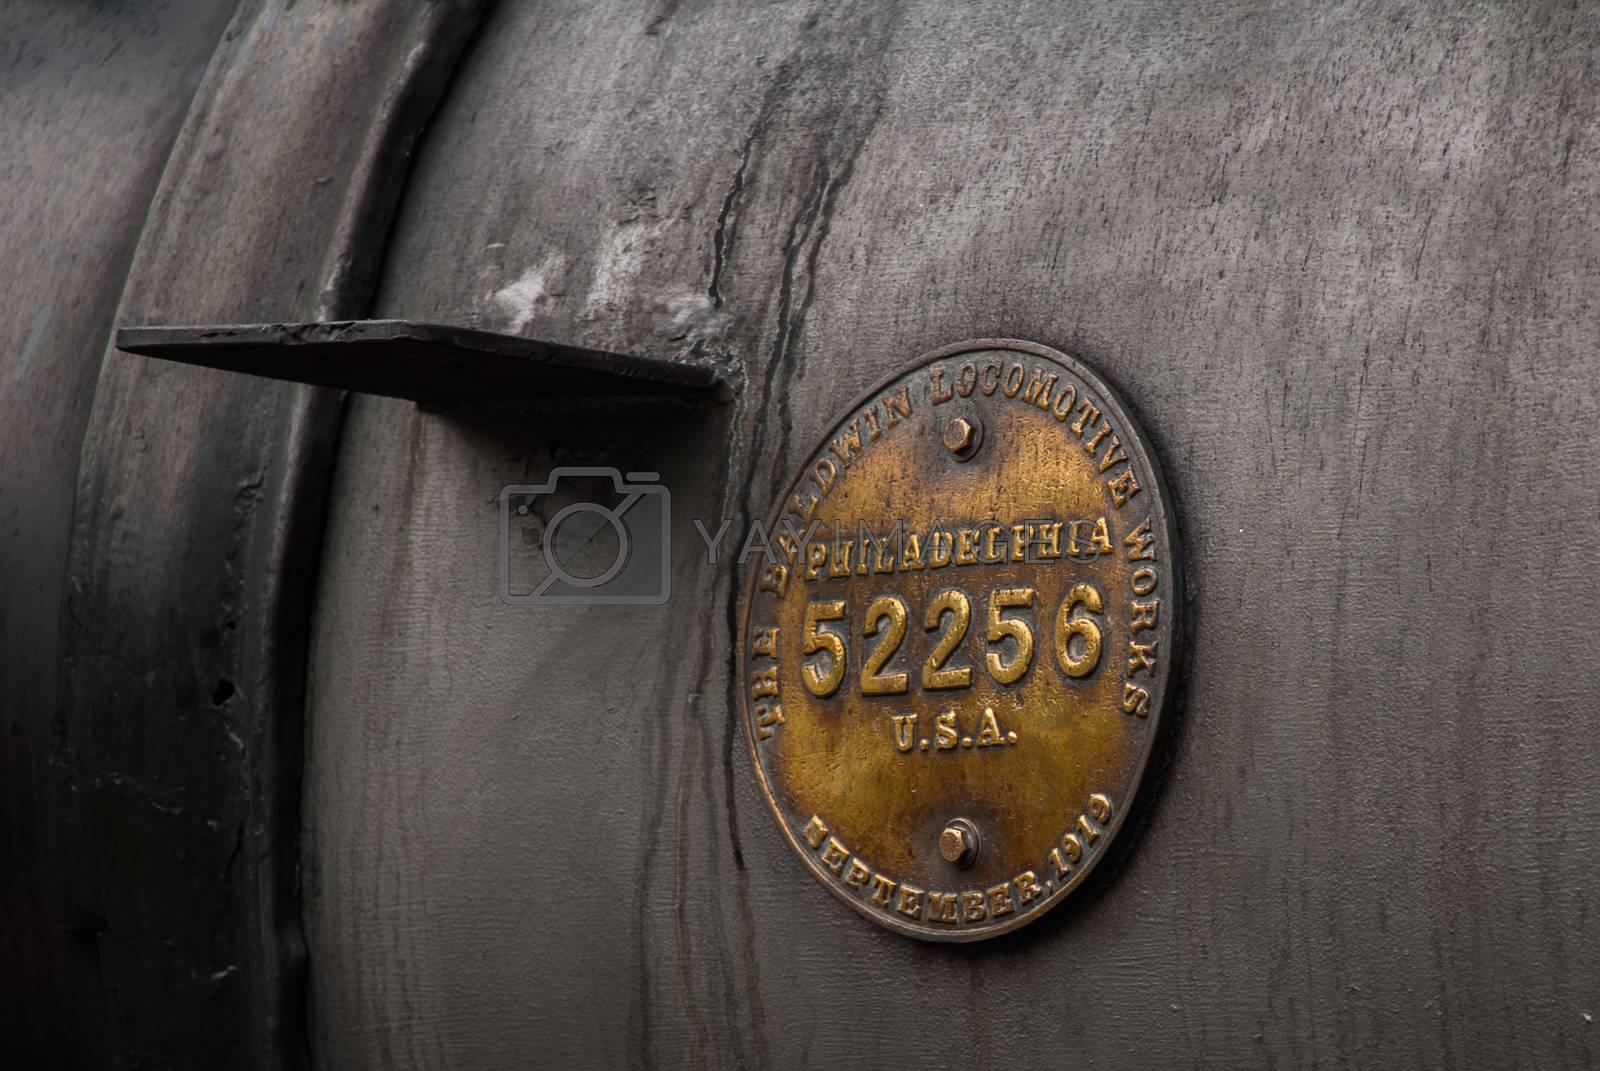 Tiradentes, Minas Gerais, Brazil: Old May Smoke train in Tiradentes, a Colonial Unesco World Heritage city.